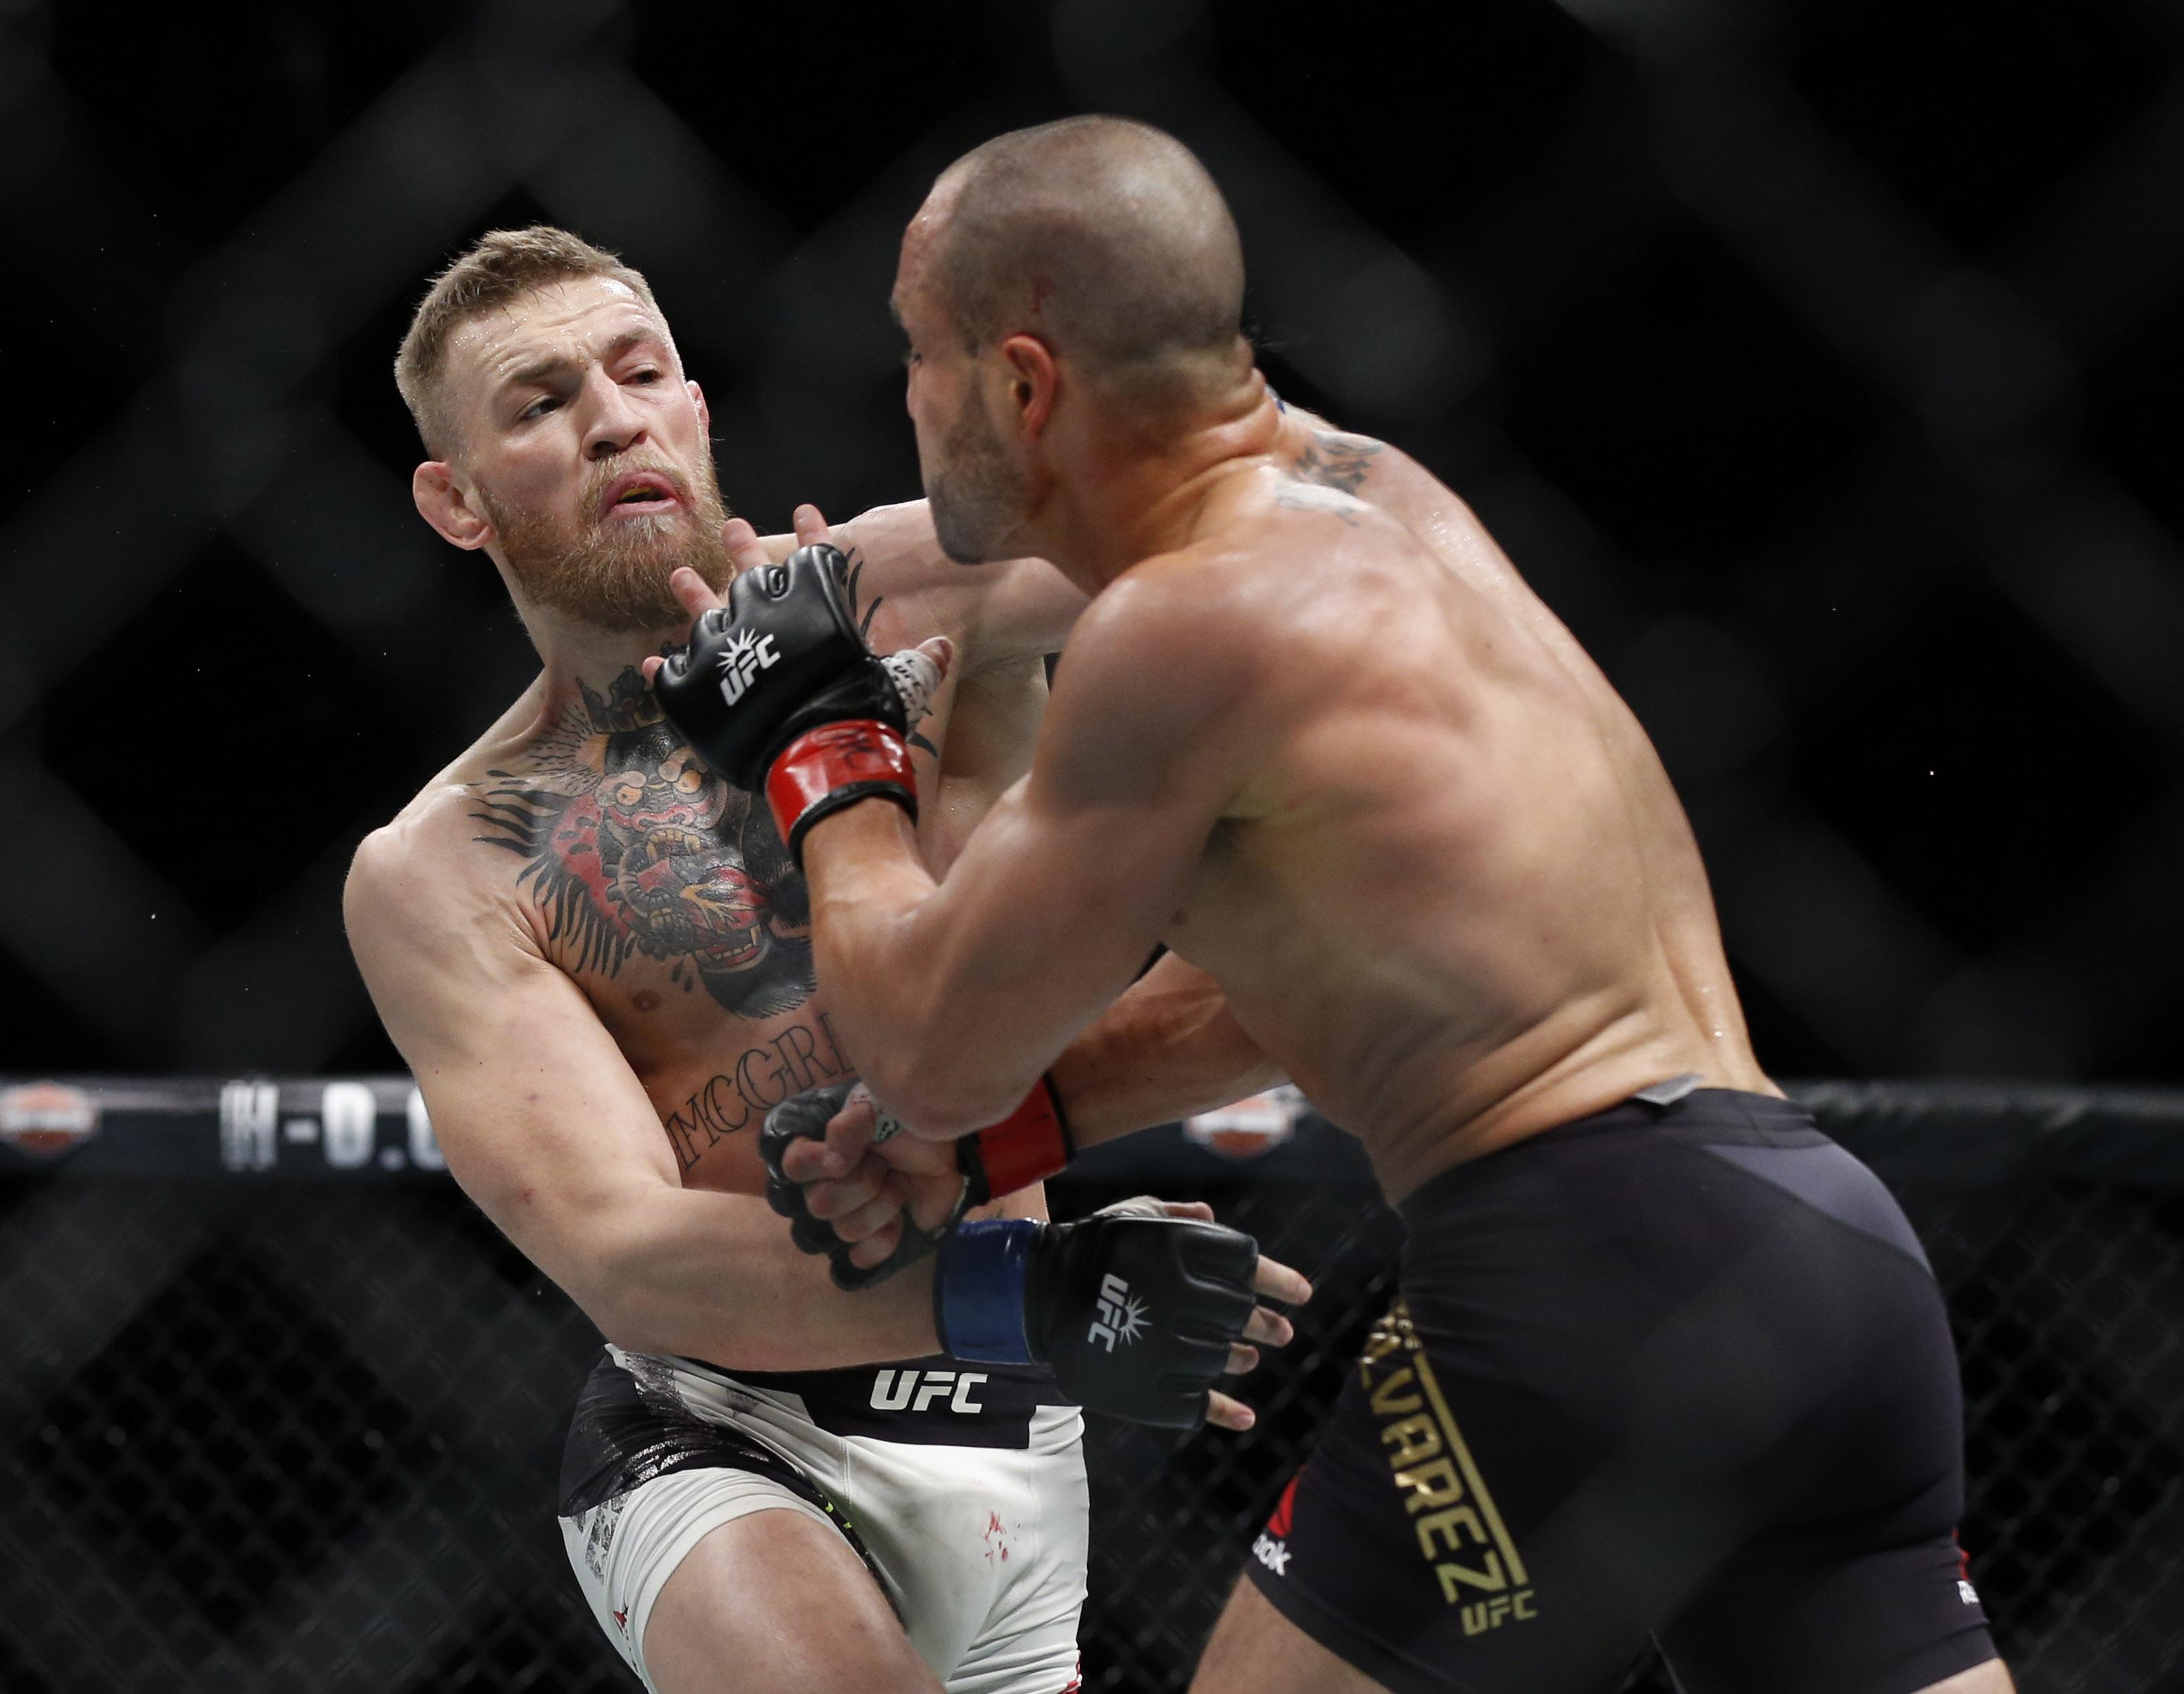 MMA: UFC 205-McGregor vs Alvarez